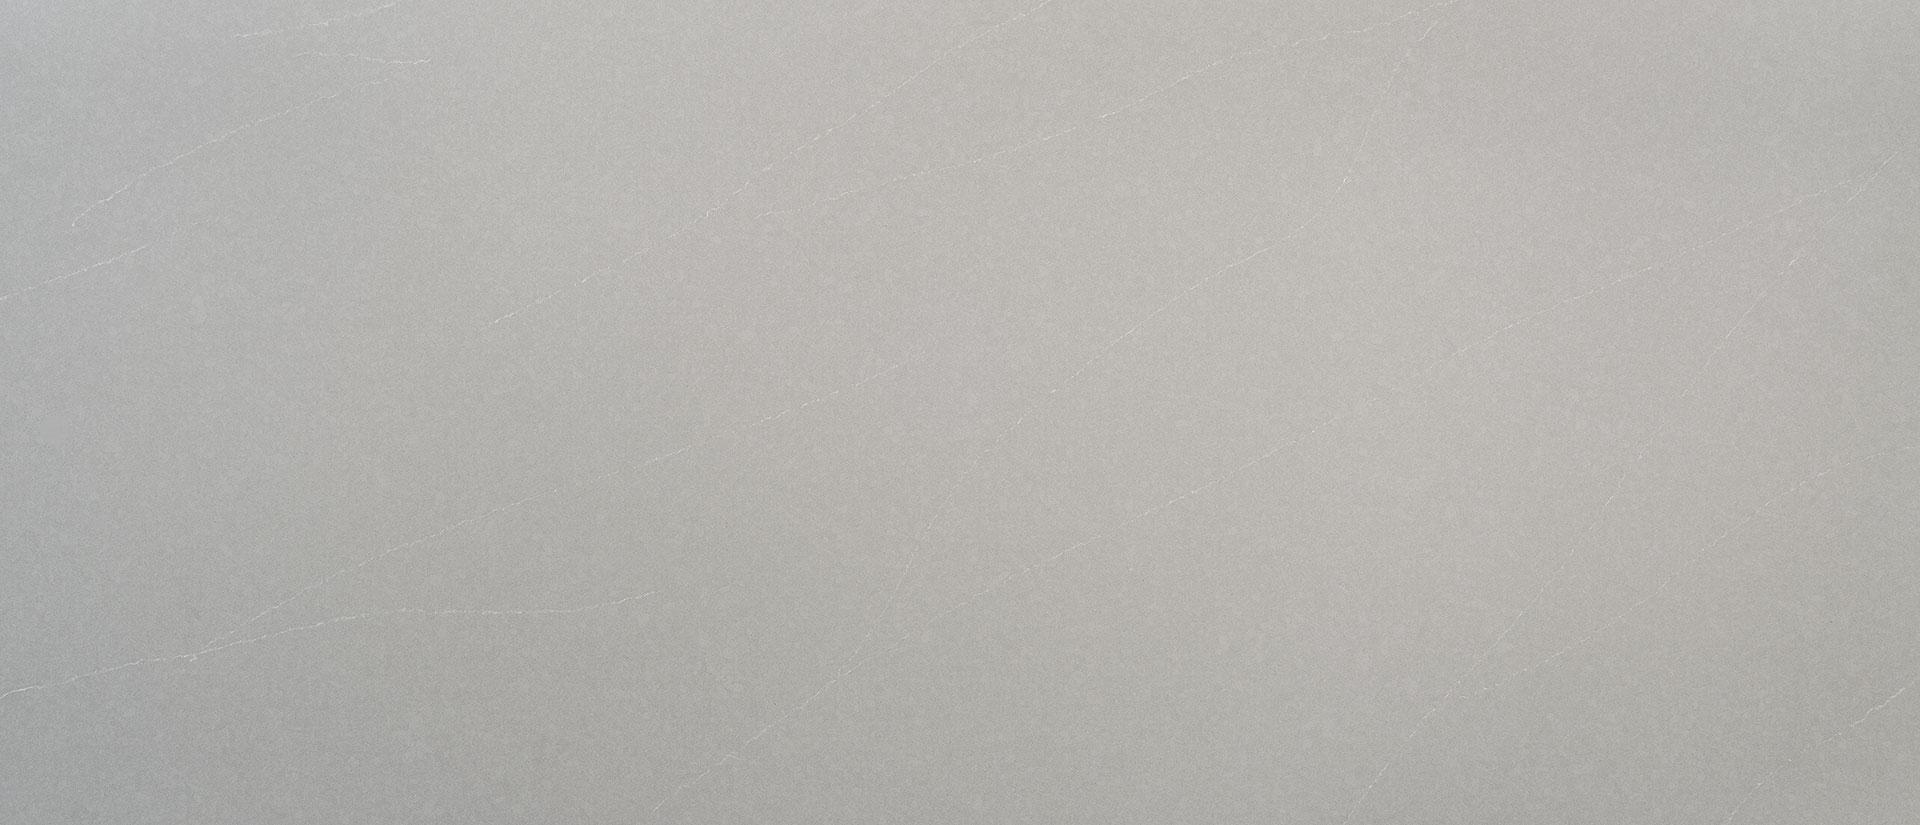 Soapstone Mist Concrete Quartz